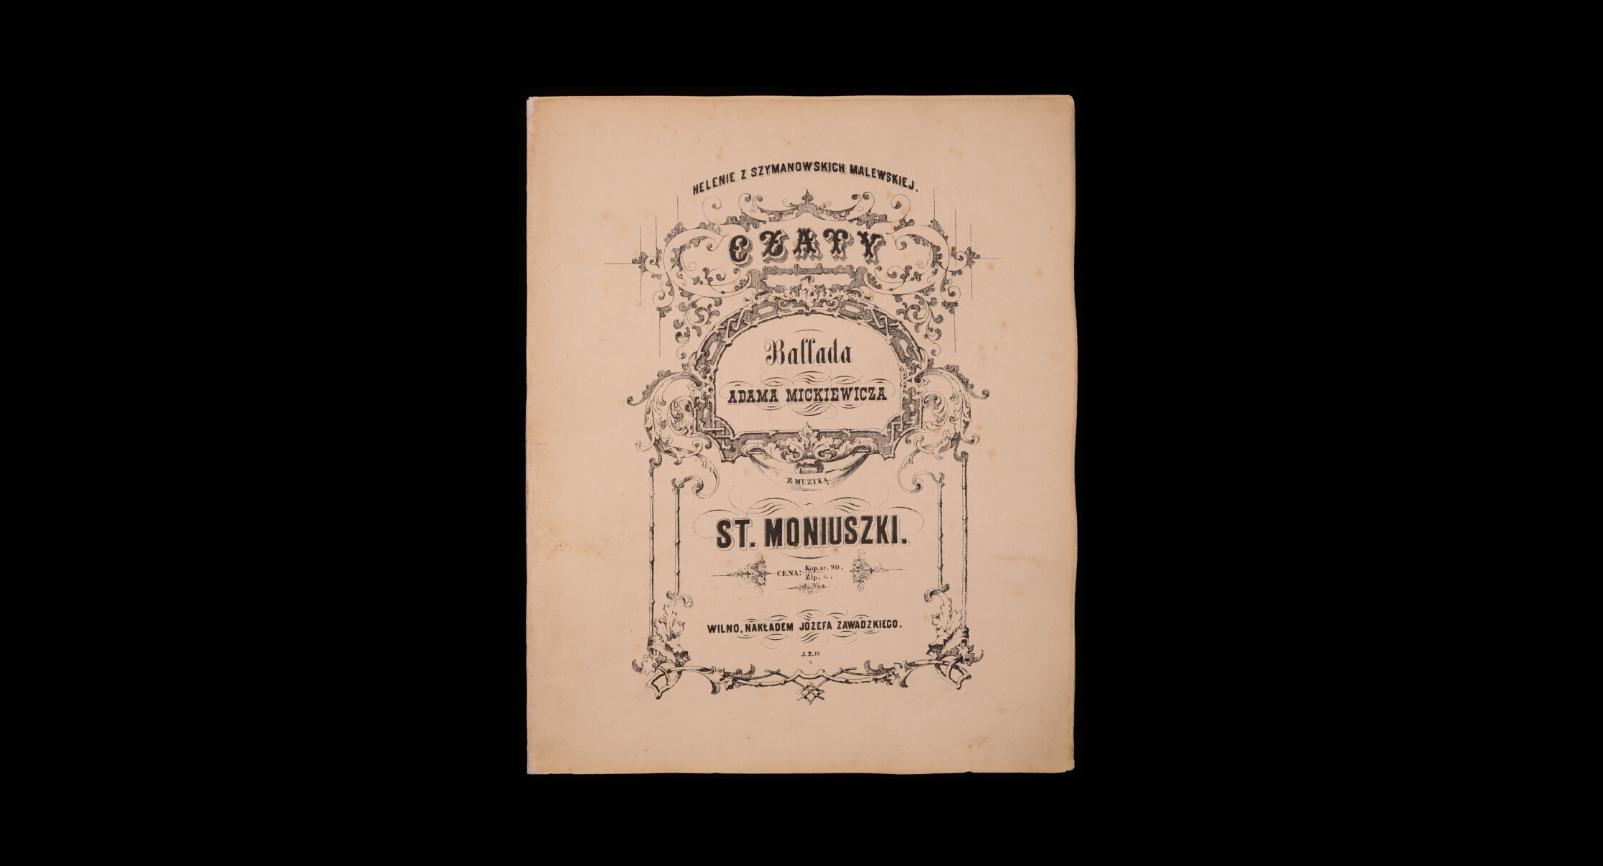 Koncert - Pieśni, duety i ballady Moniuszki